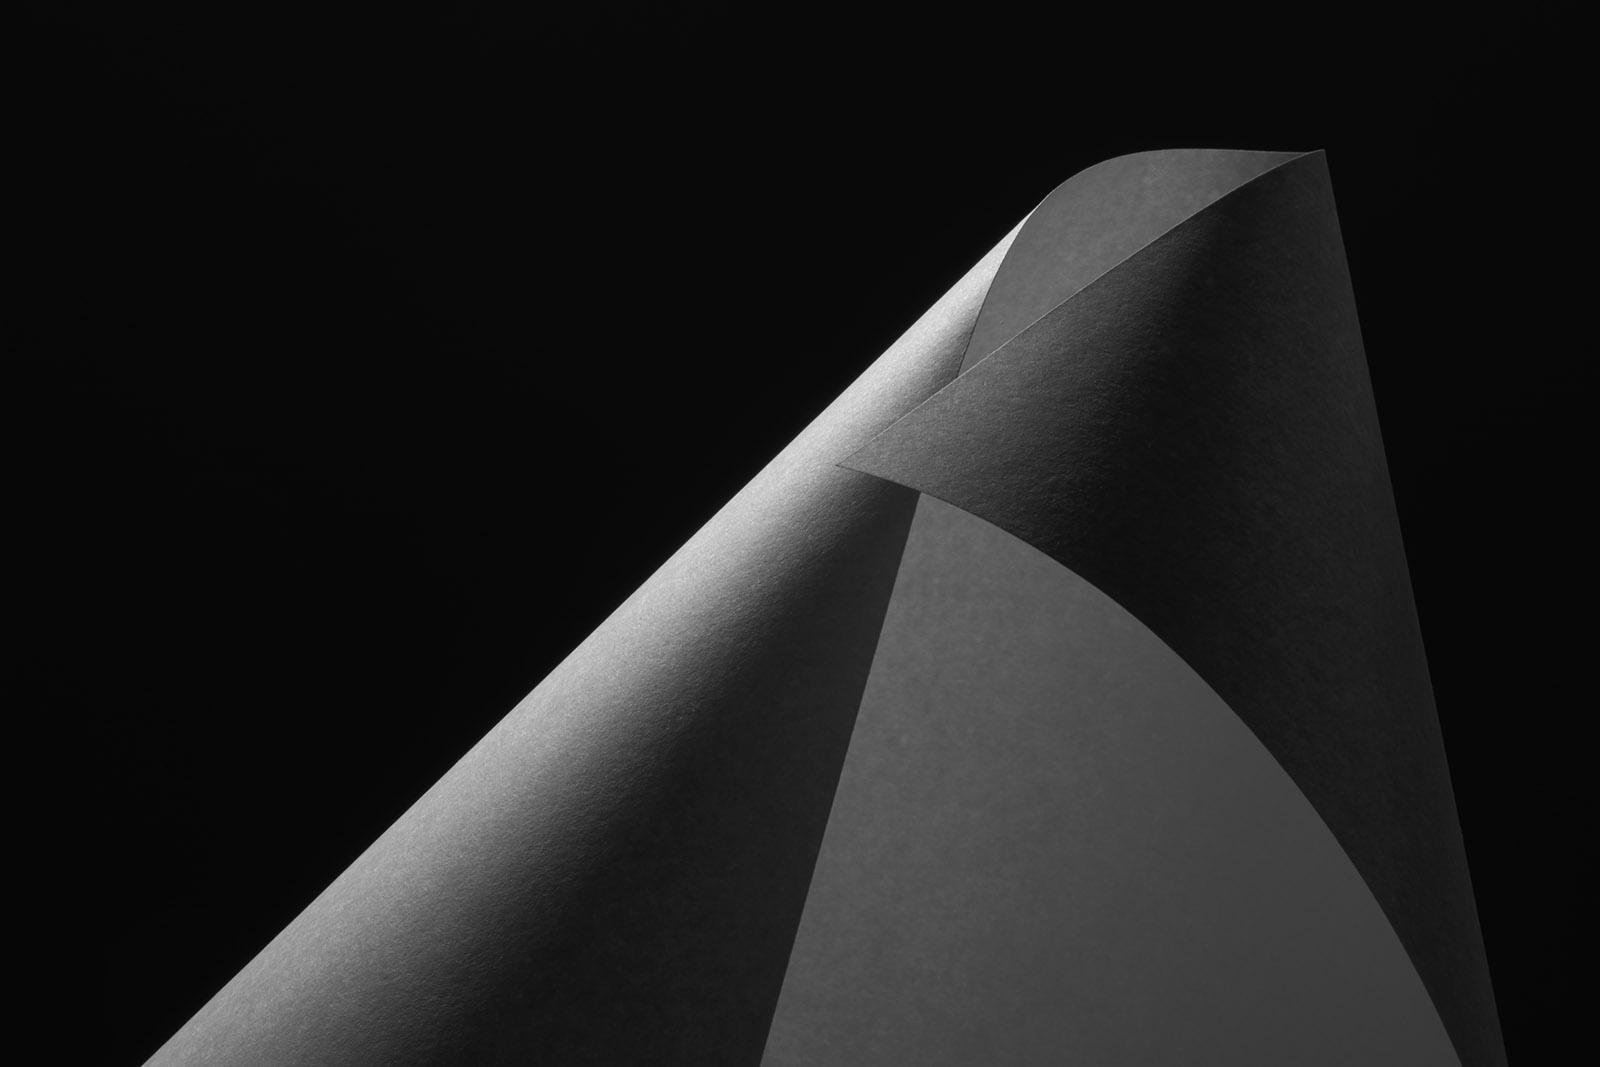 kwp-paper-3.jpg